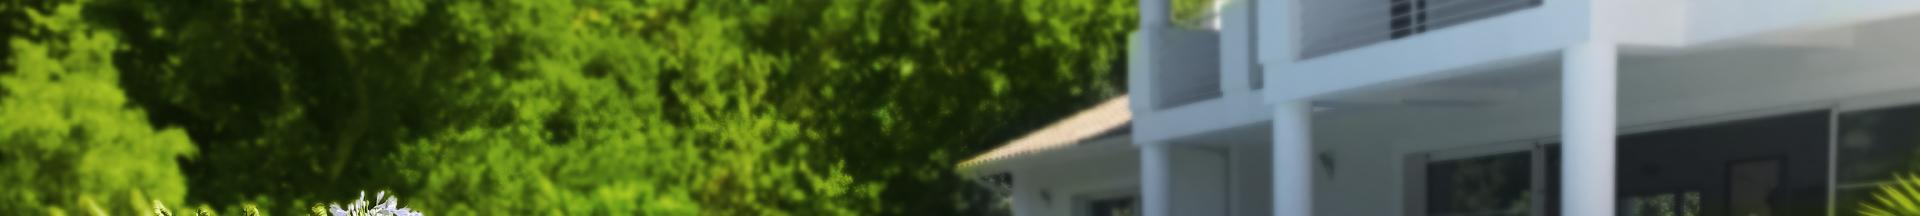 Aménagement de jardin Landes, Aménagement de jardin Mont de Marsan, Arrosage Landes, Arrosage Mont de Marsan, Clôture Landes, Clôture Mont de Marsan, Création de bassin Landes, Création de bassin Mont de Marsan, Paysagiste Landes, Paysagiste Mont de Marsan, Terrasse bois Landes, Terrasse bois Mont de Marsan, Terrasse Landes, Terrasse Mont de Marsan